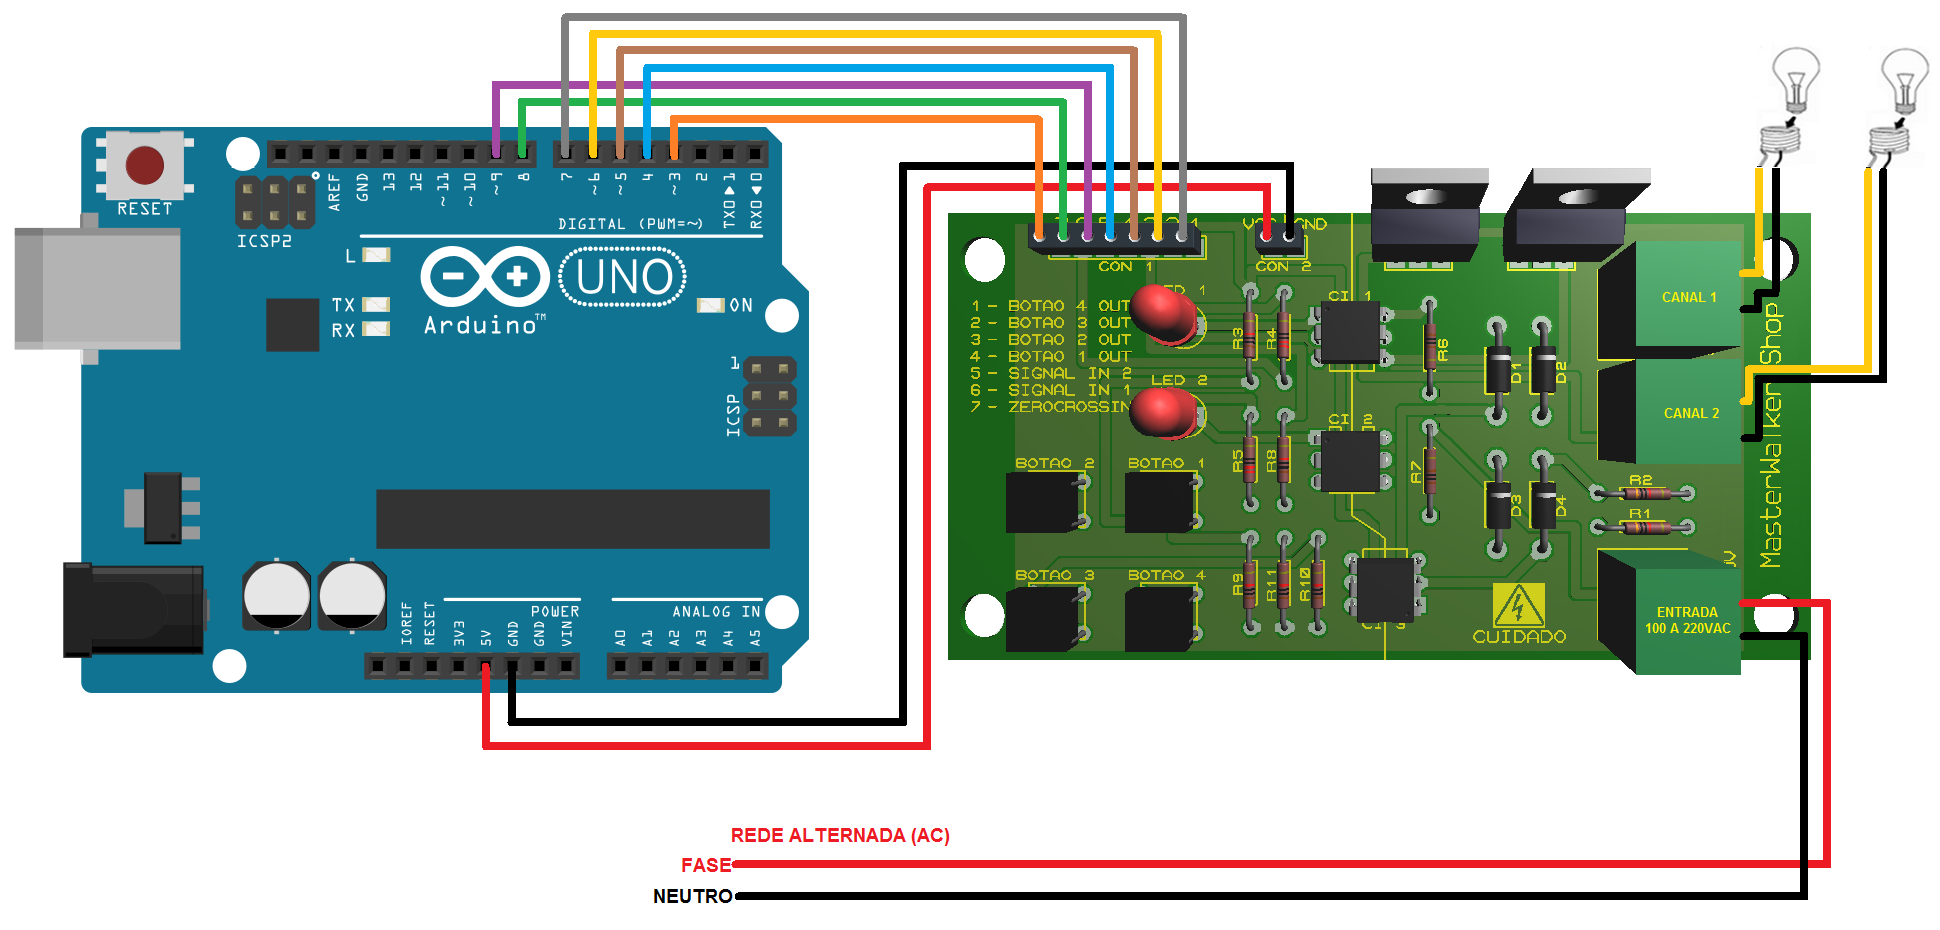 img01_arduino_utilizando_o_modulo_dimmer_ac_de_2_canais_raspberry_pic_esp8266_nodemcu_motor_ventilador_potencia